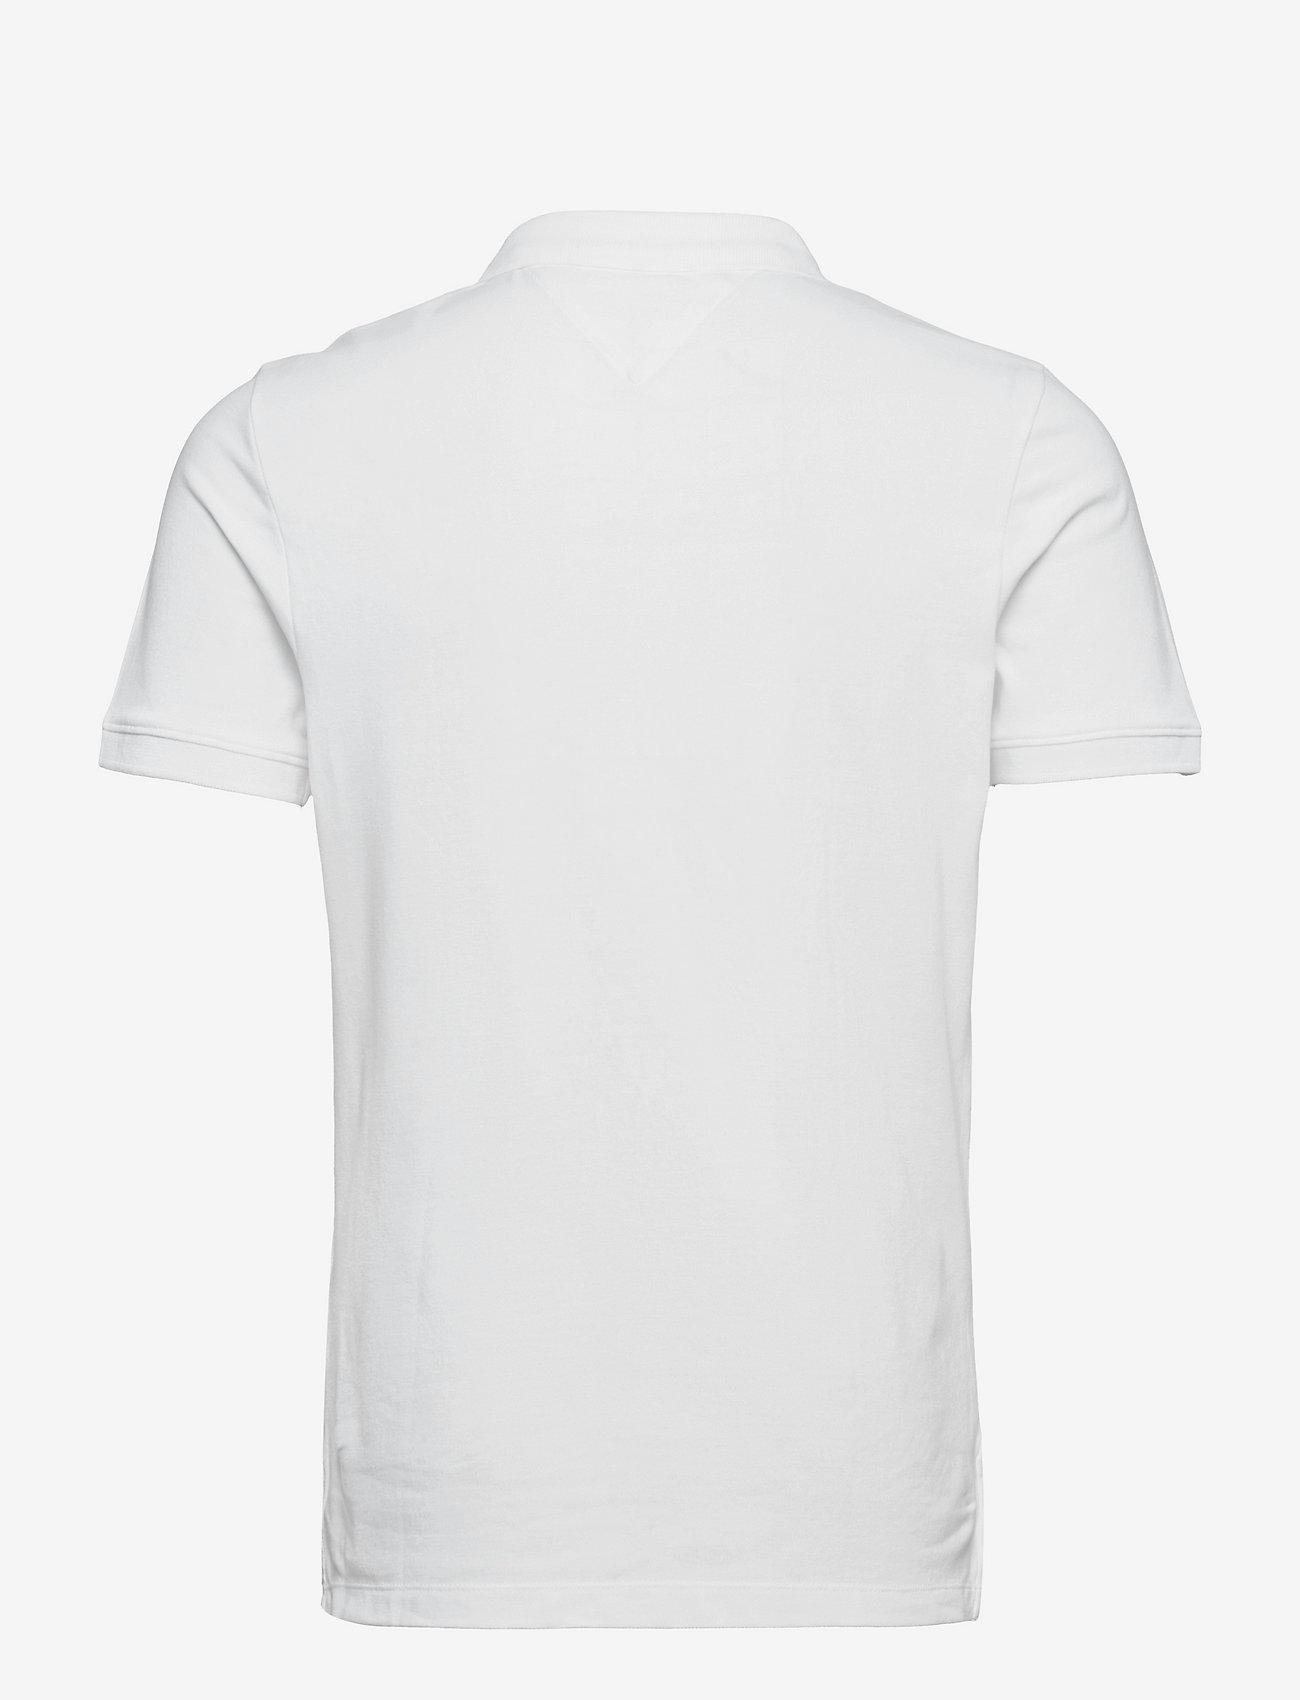 Tommy Jeans - TJM CLASSICS SOLID S - kortärmade pikéer - white - 1